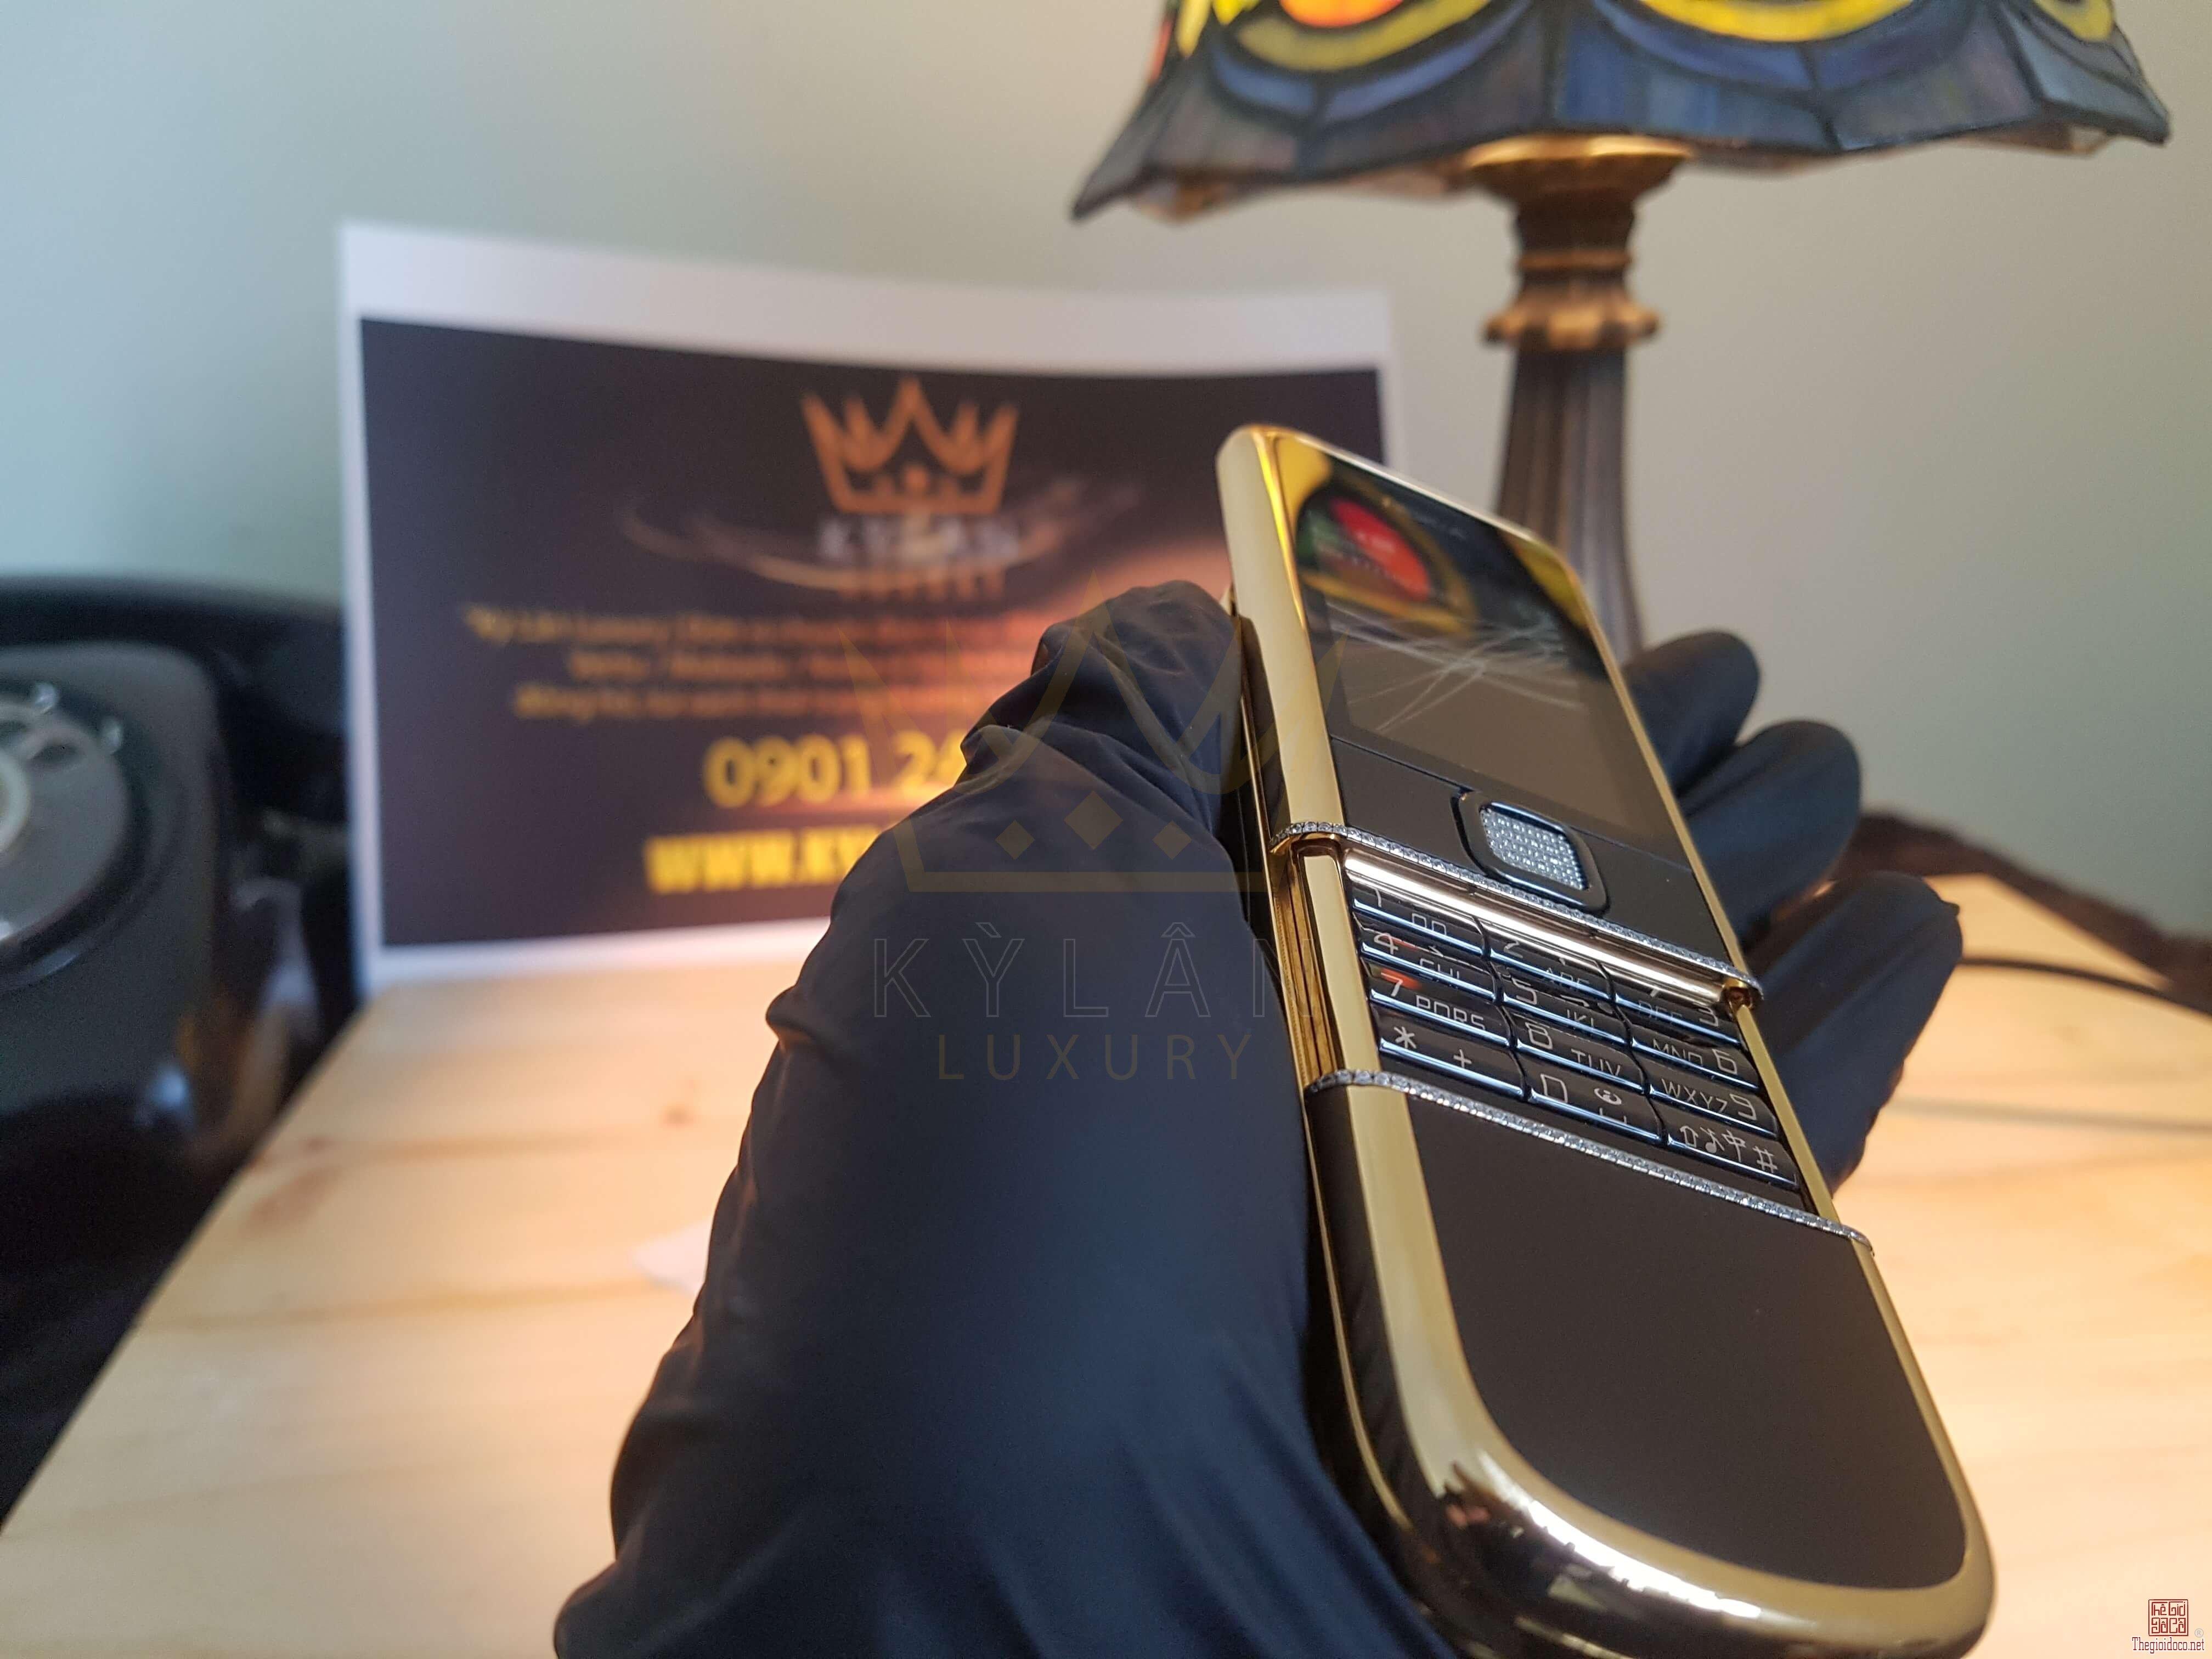 Nokia 8800 Diamond Gold Arter mạ vàng 24k máy like new